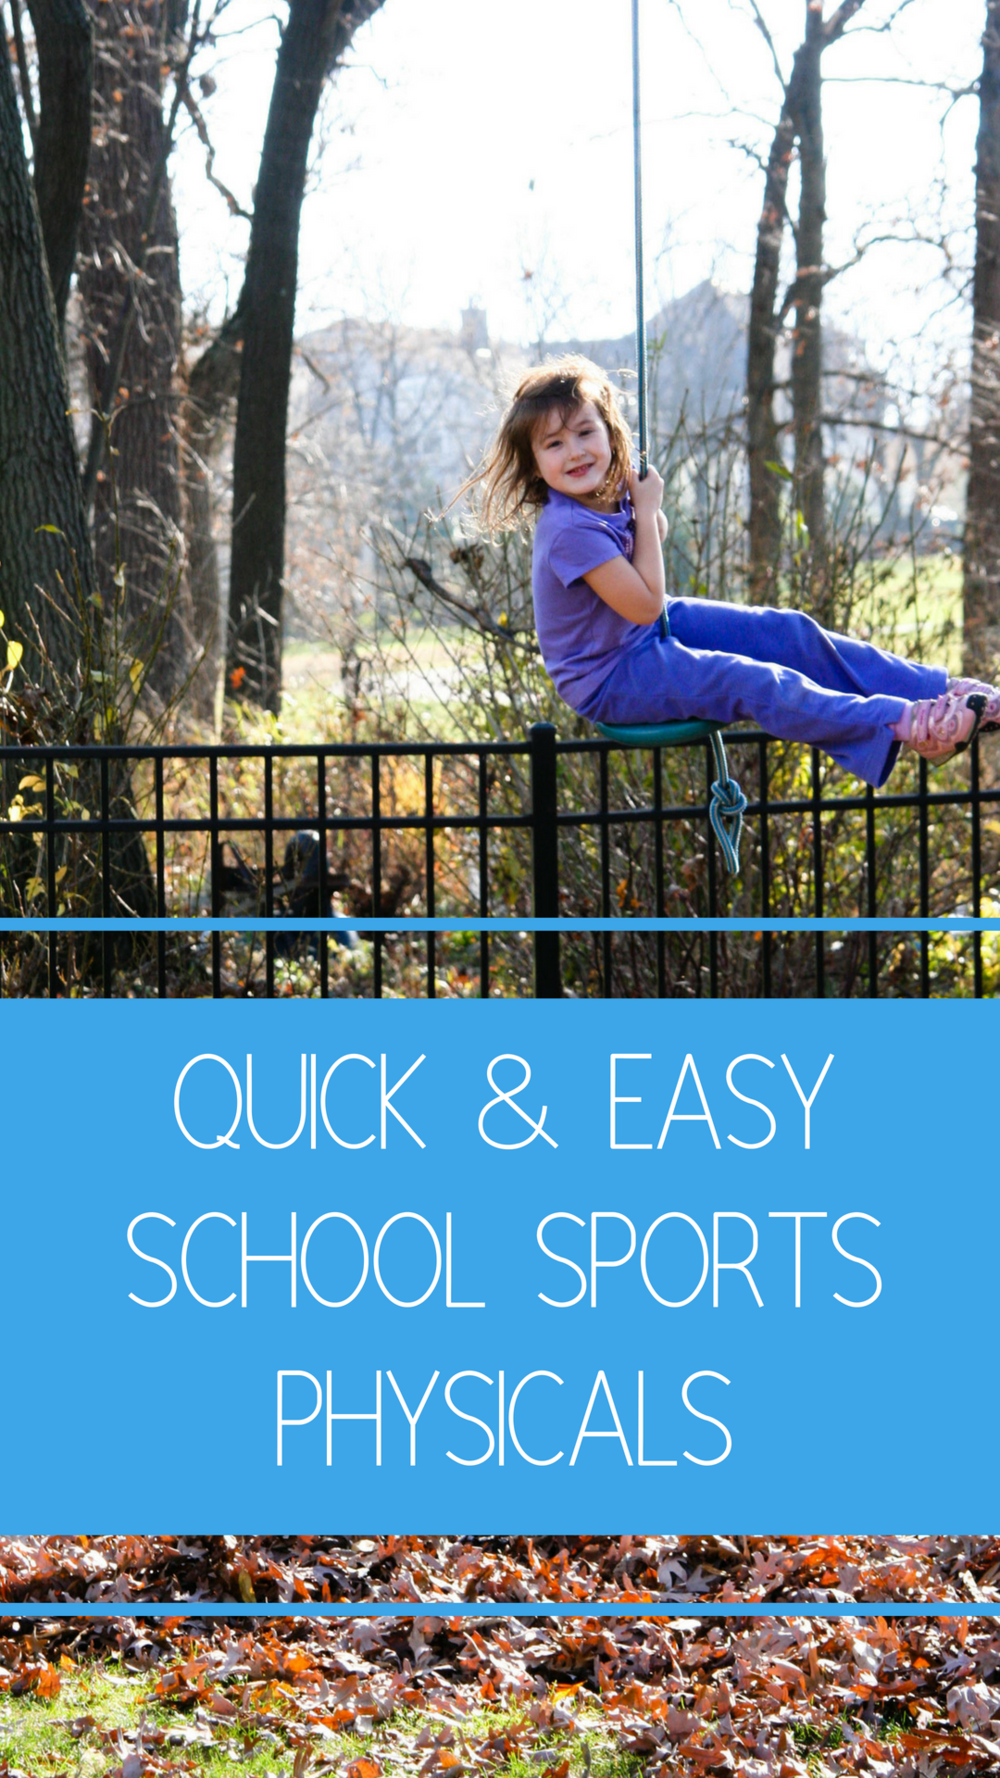 Walgreens School Sports Physicals